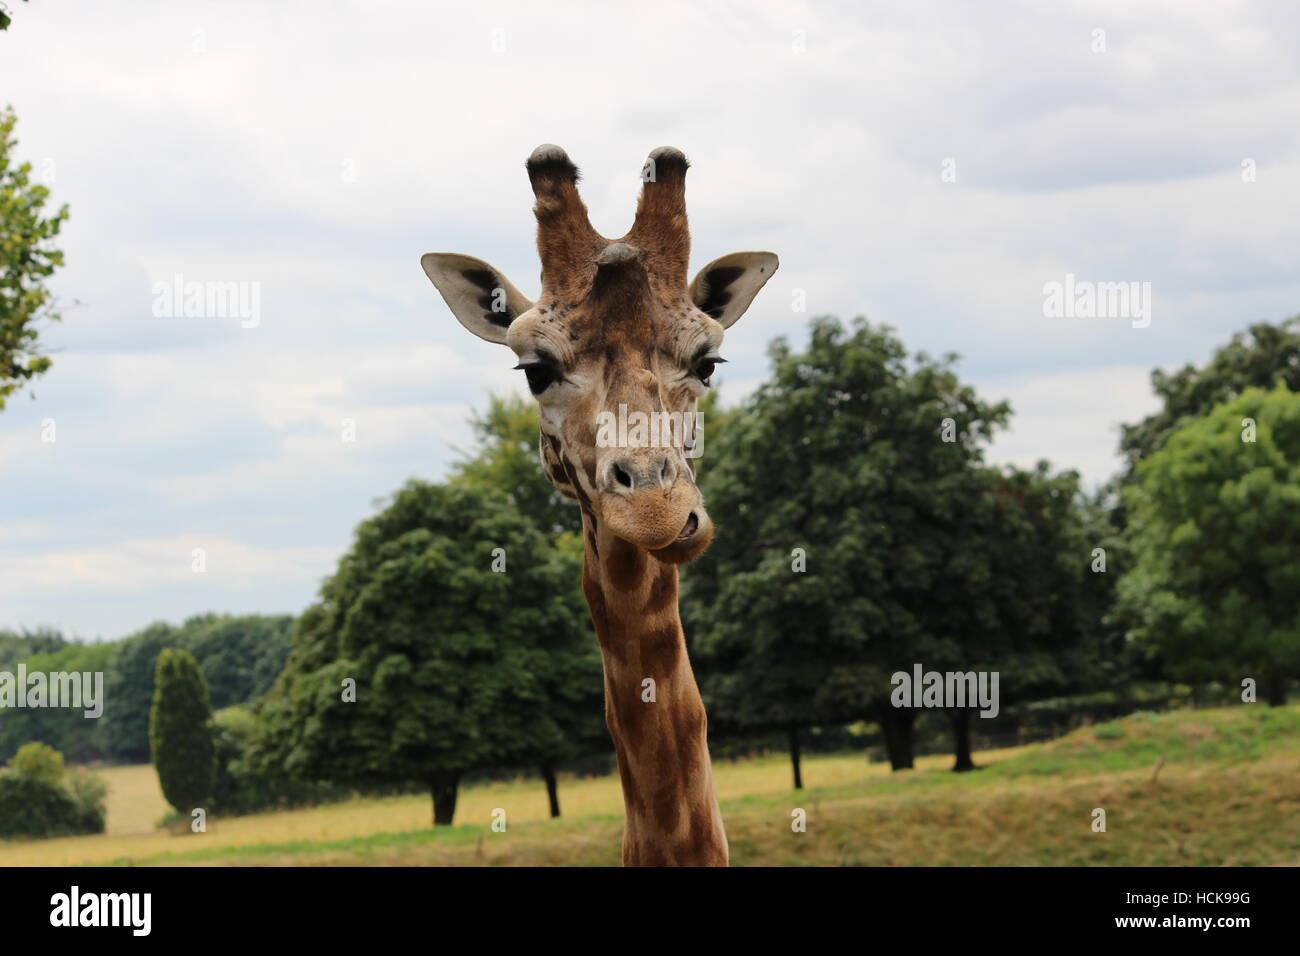 Giraffe retrato Cotswold Wildlife Park adolescente orgulloso headshot jefe hablando Imagen De Stock